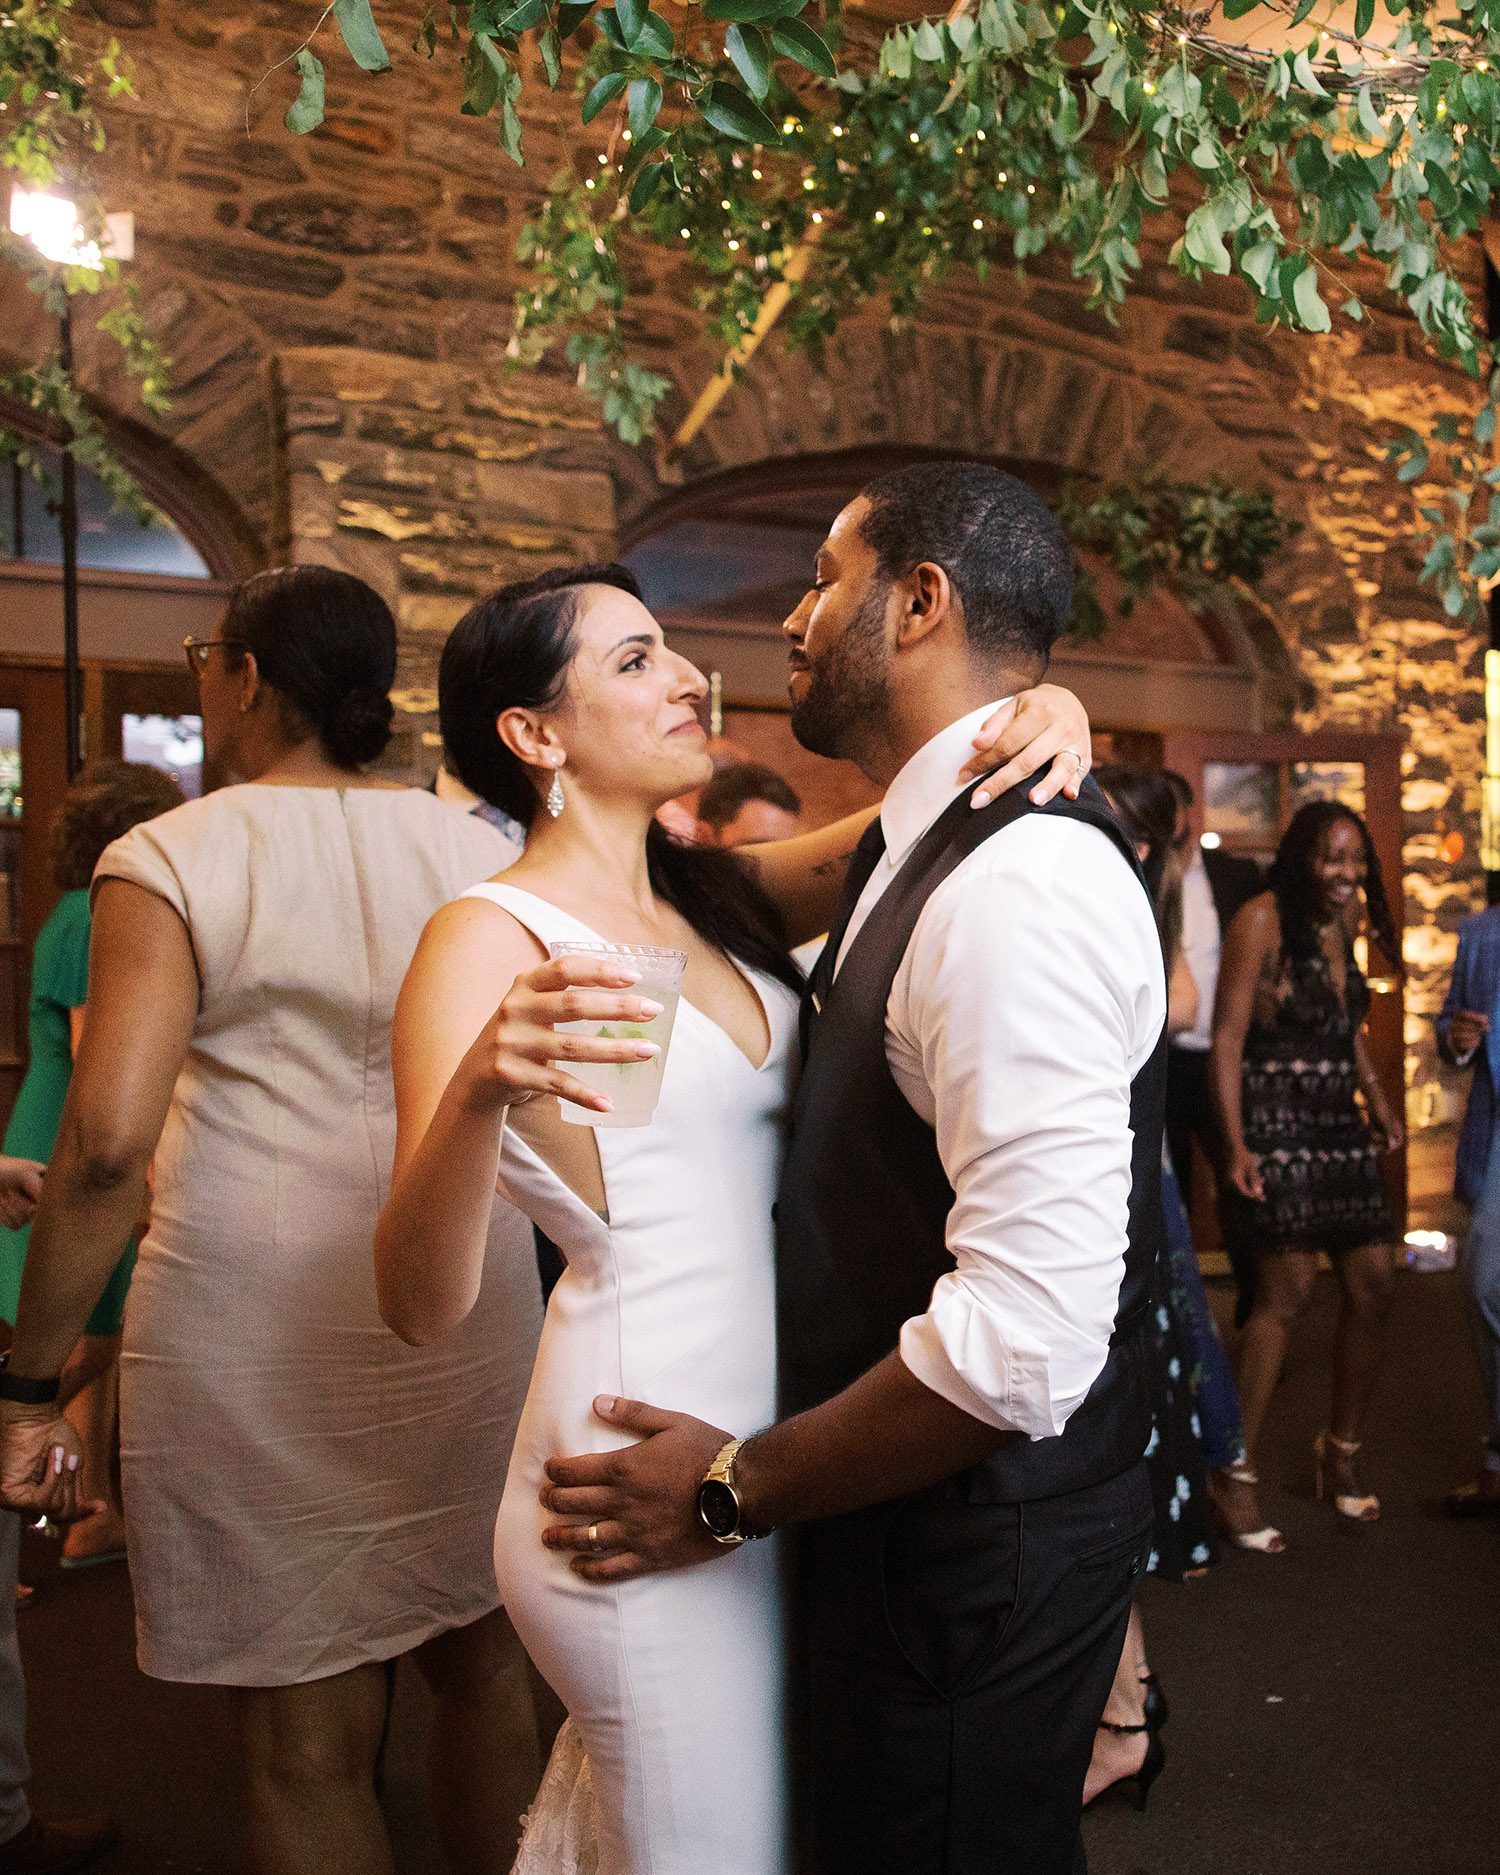 noel mike wedding couple reception dancing